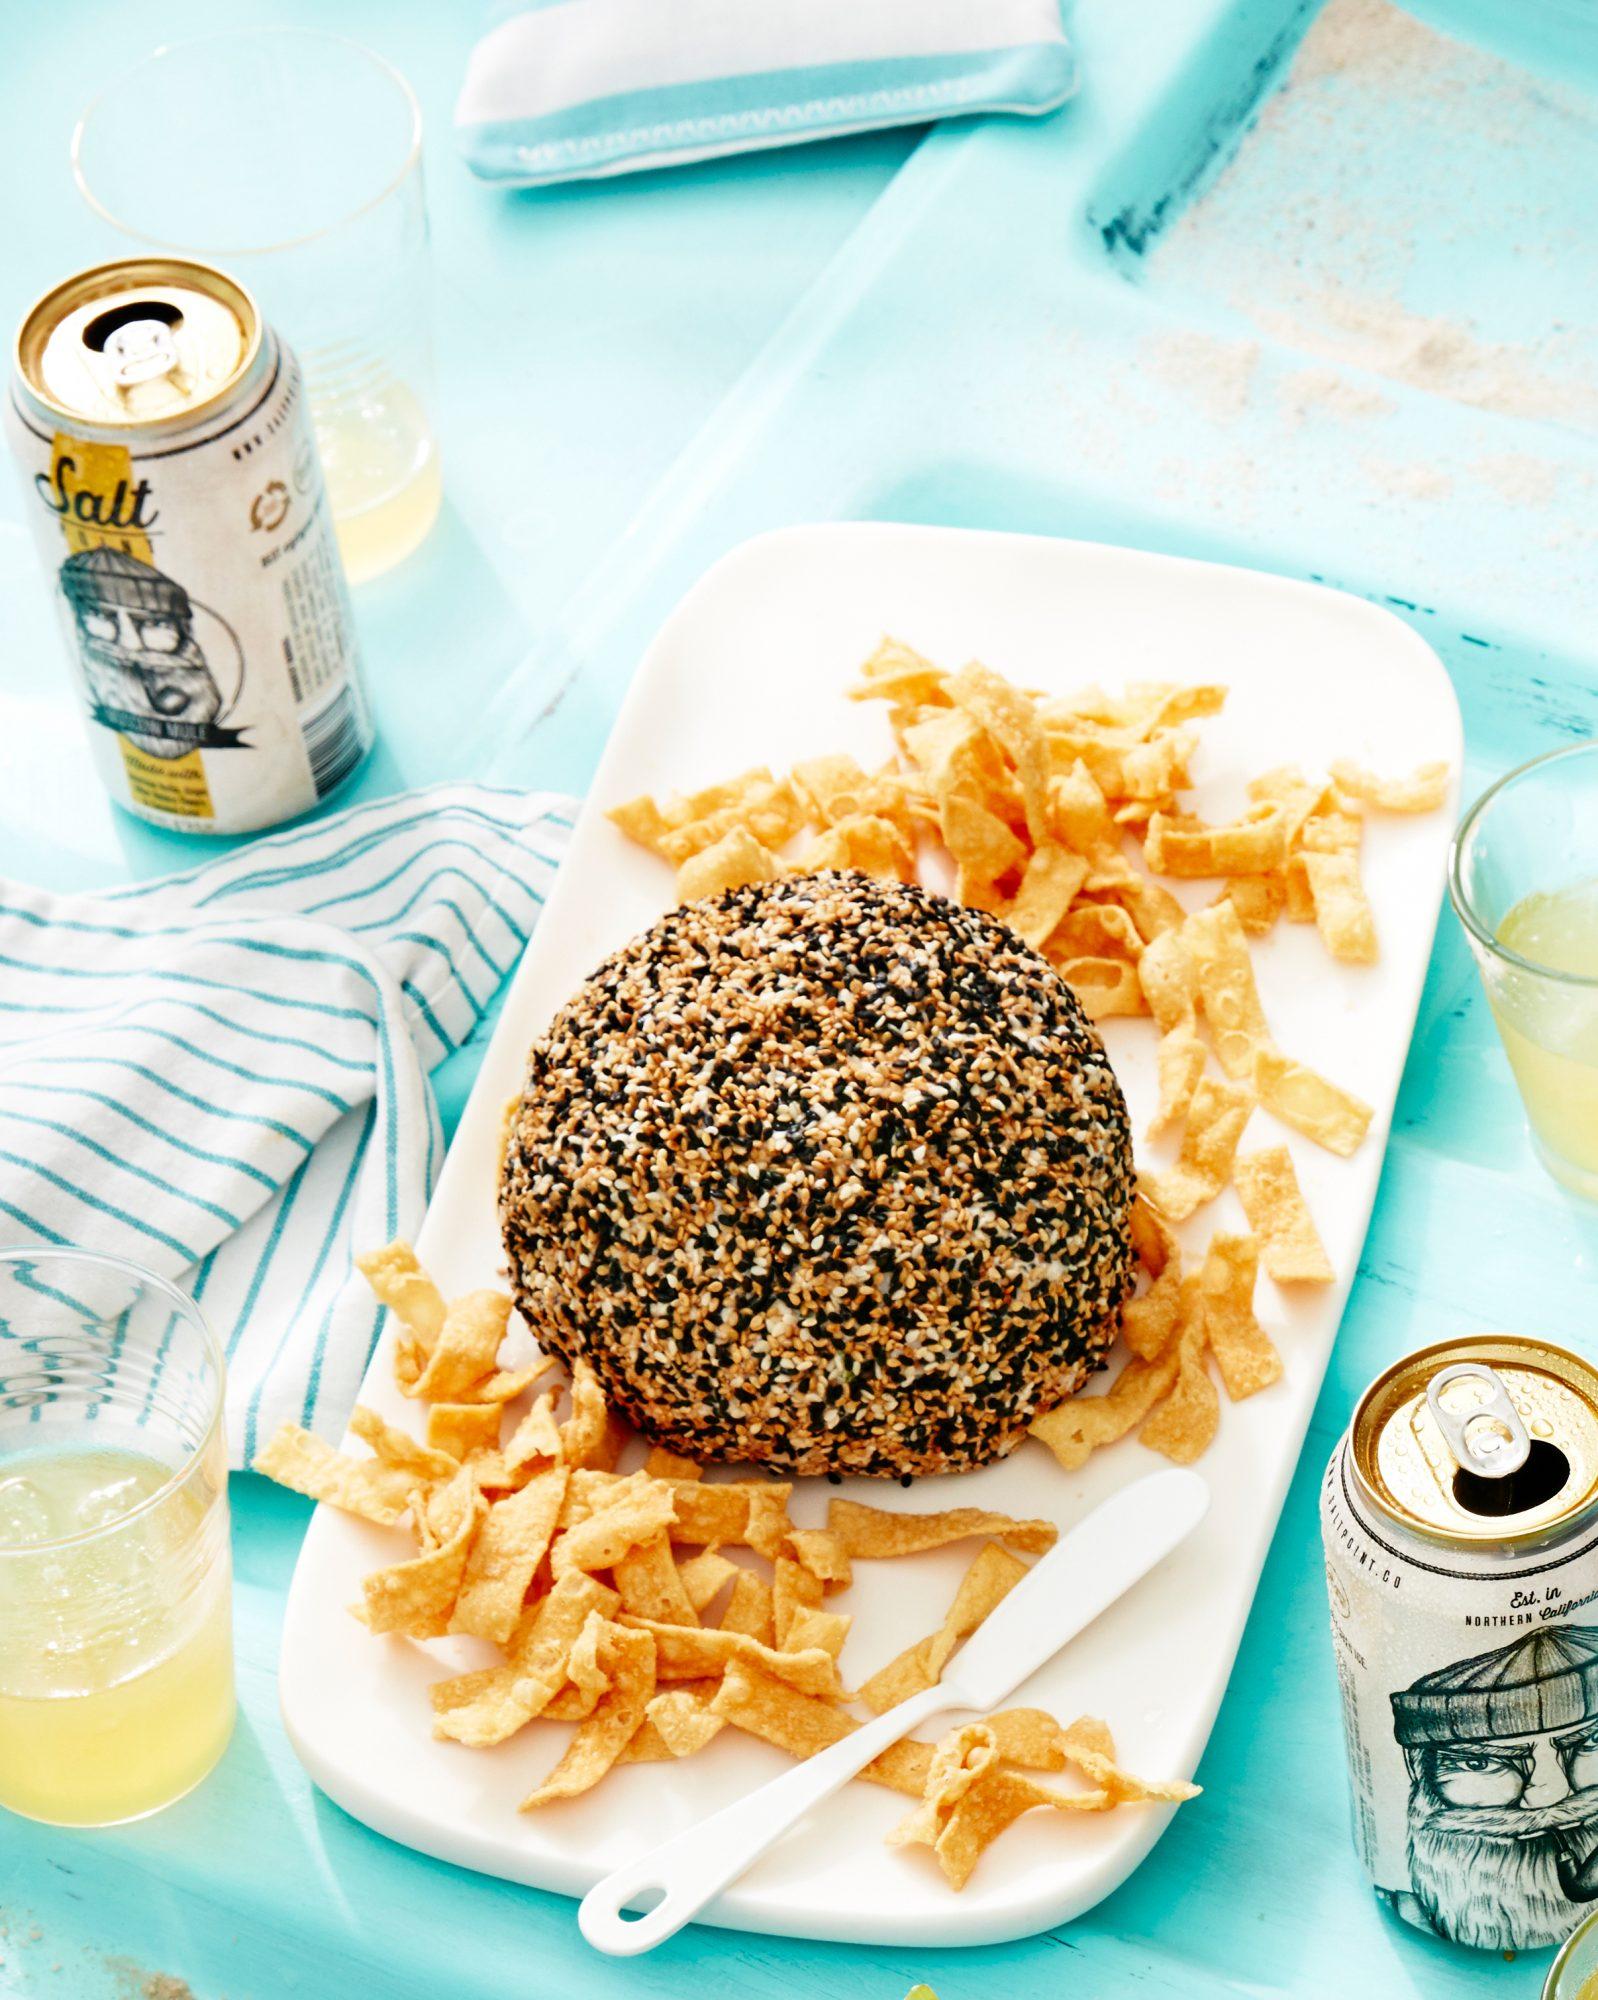 cl-Crab Rangoon Cheese Ball